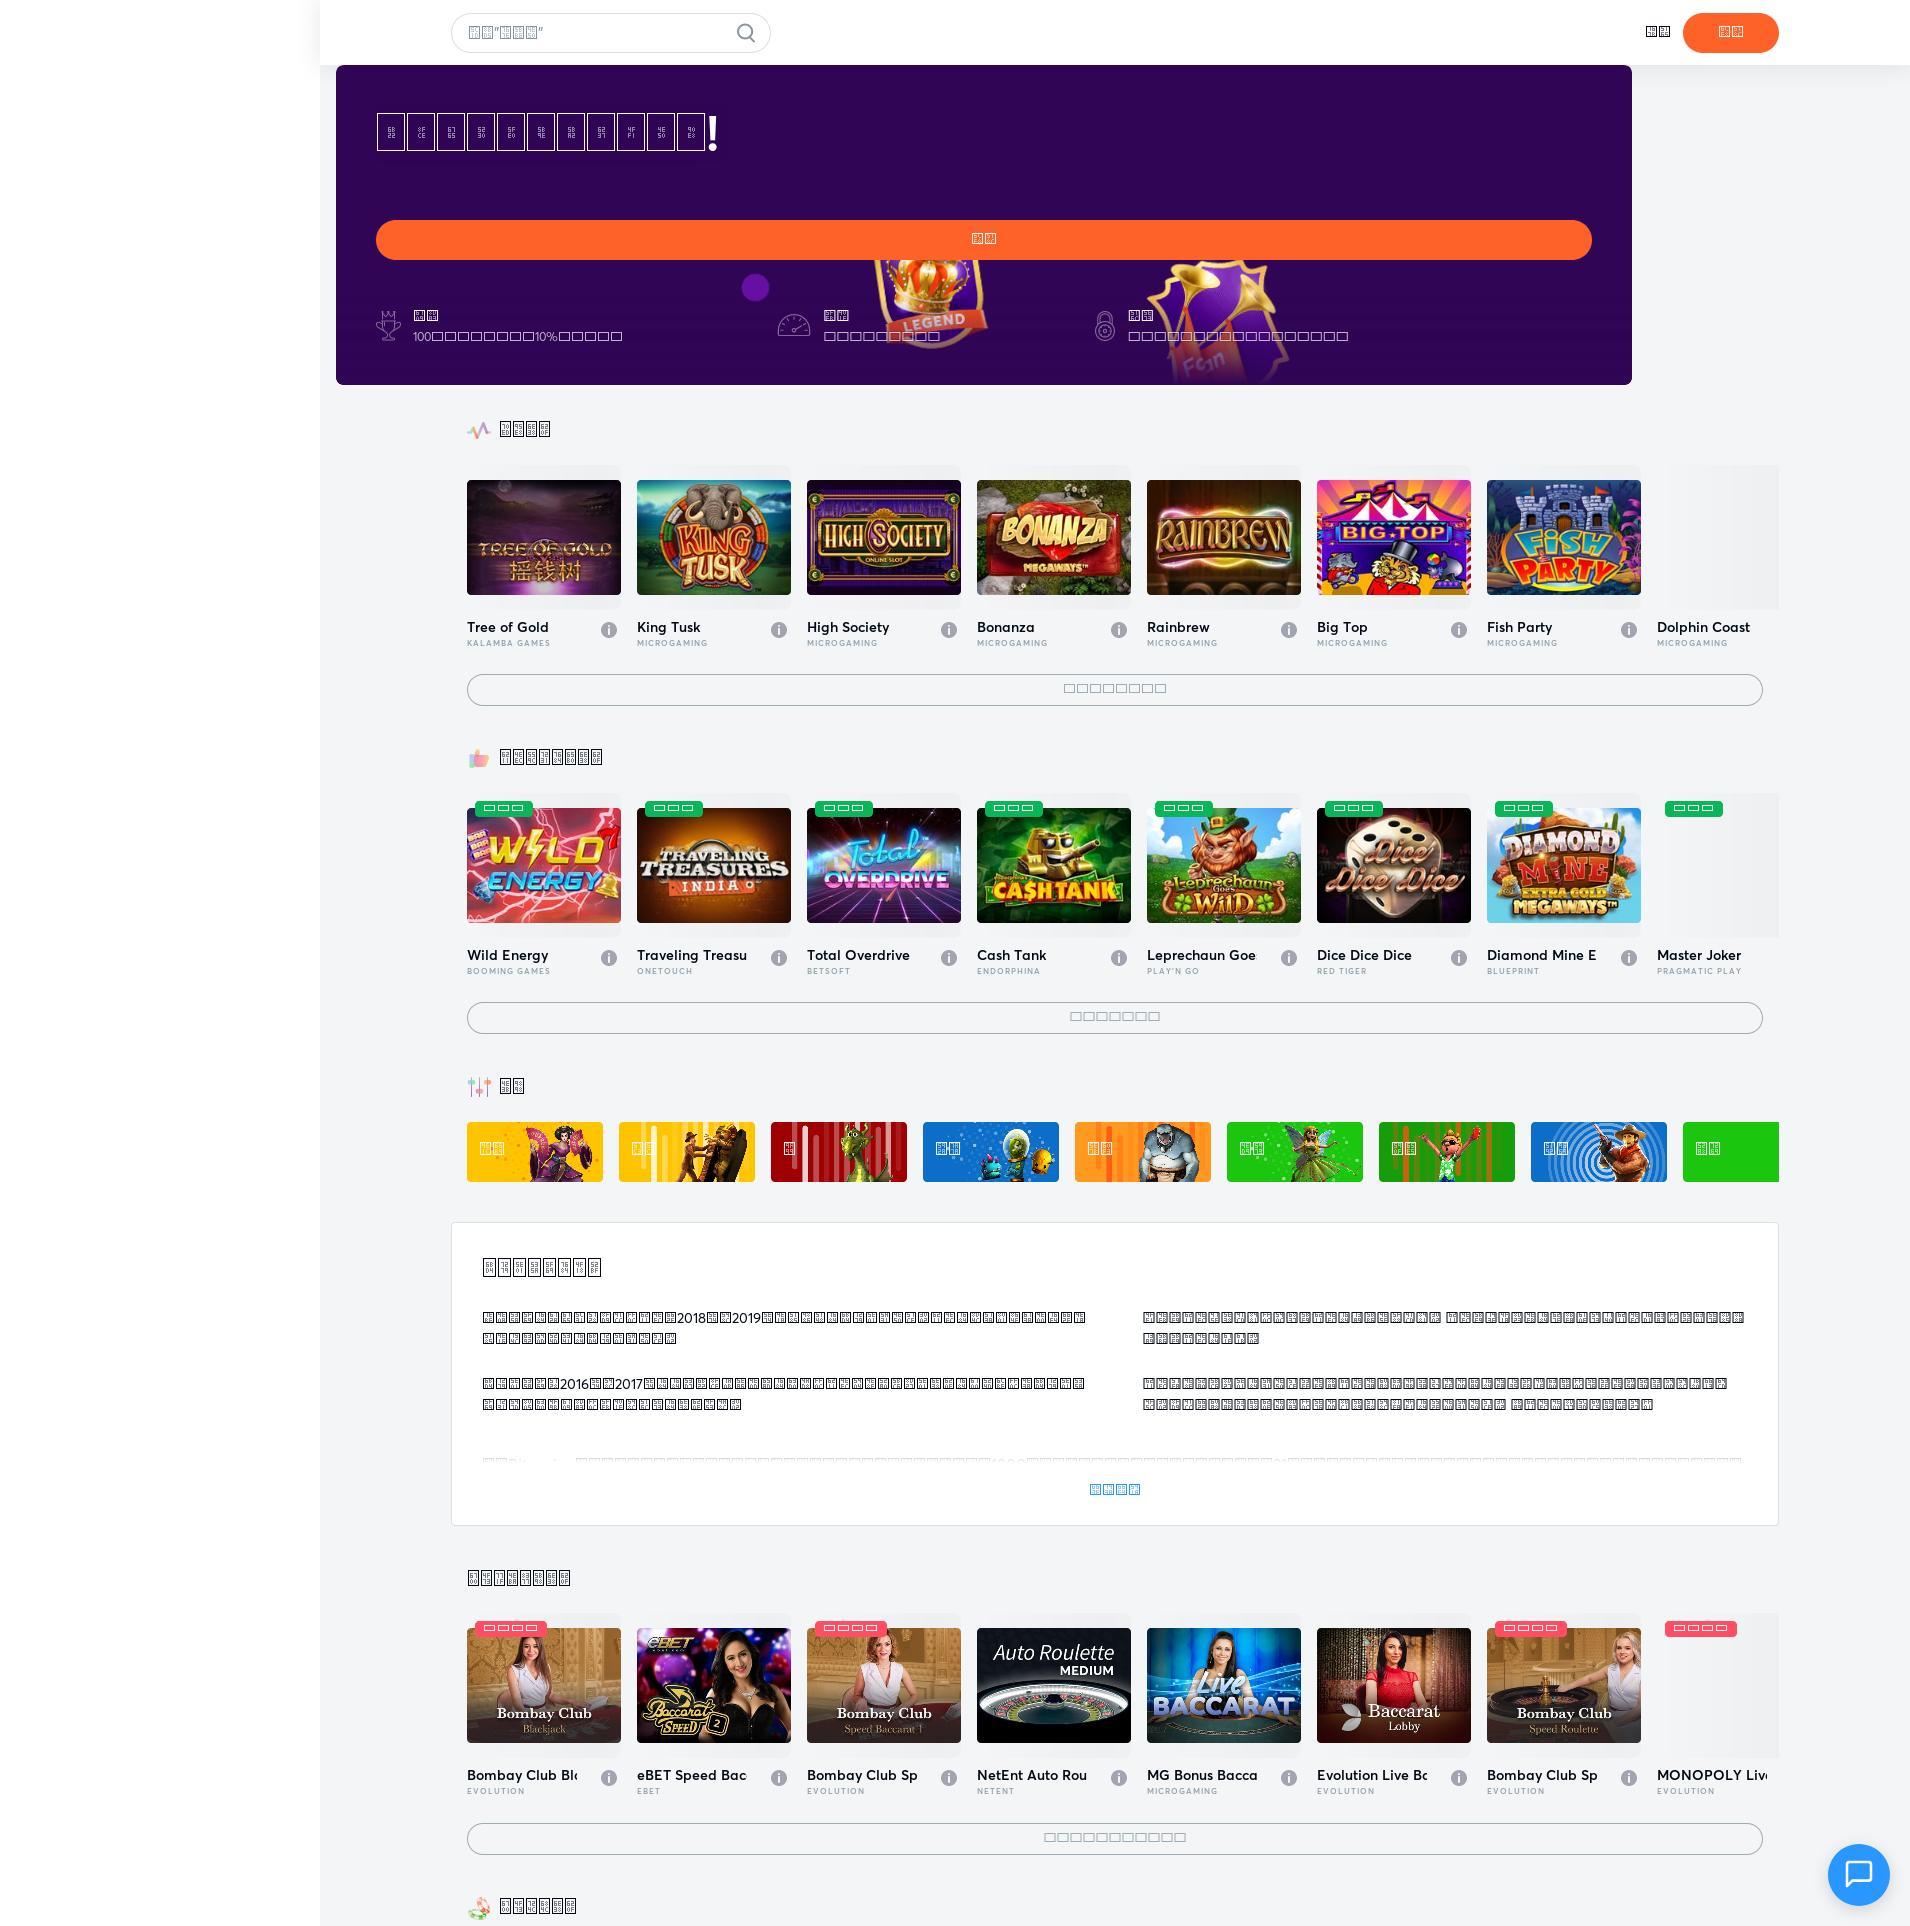 Casino screen Lobby 2020-02-19 for China